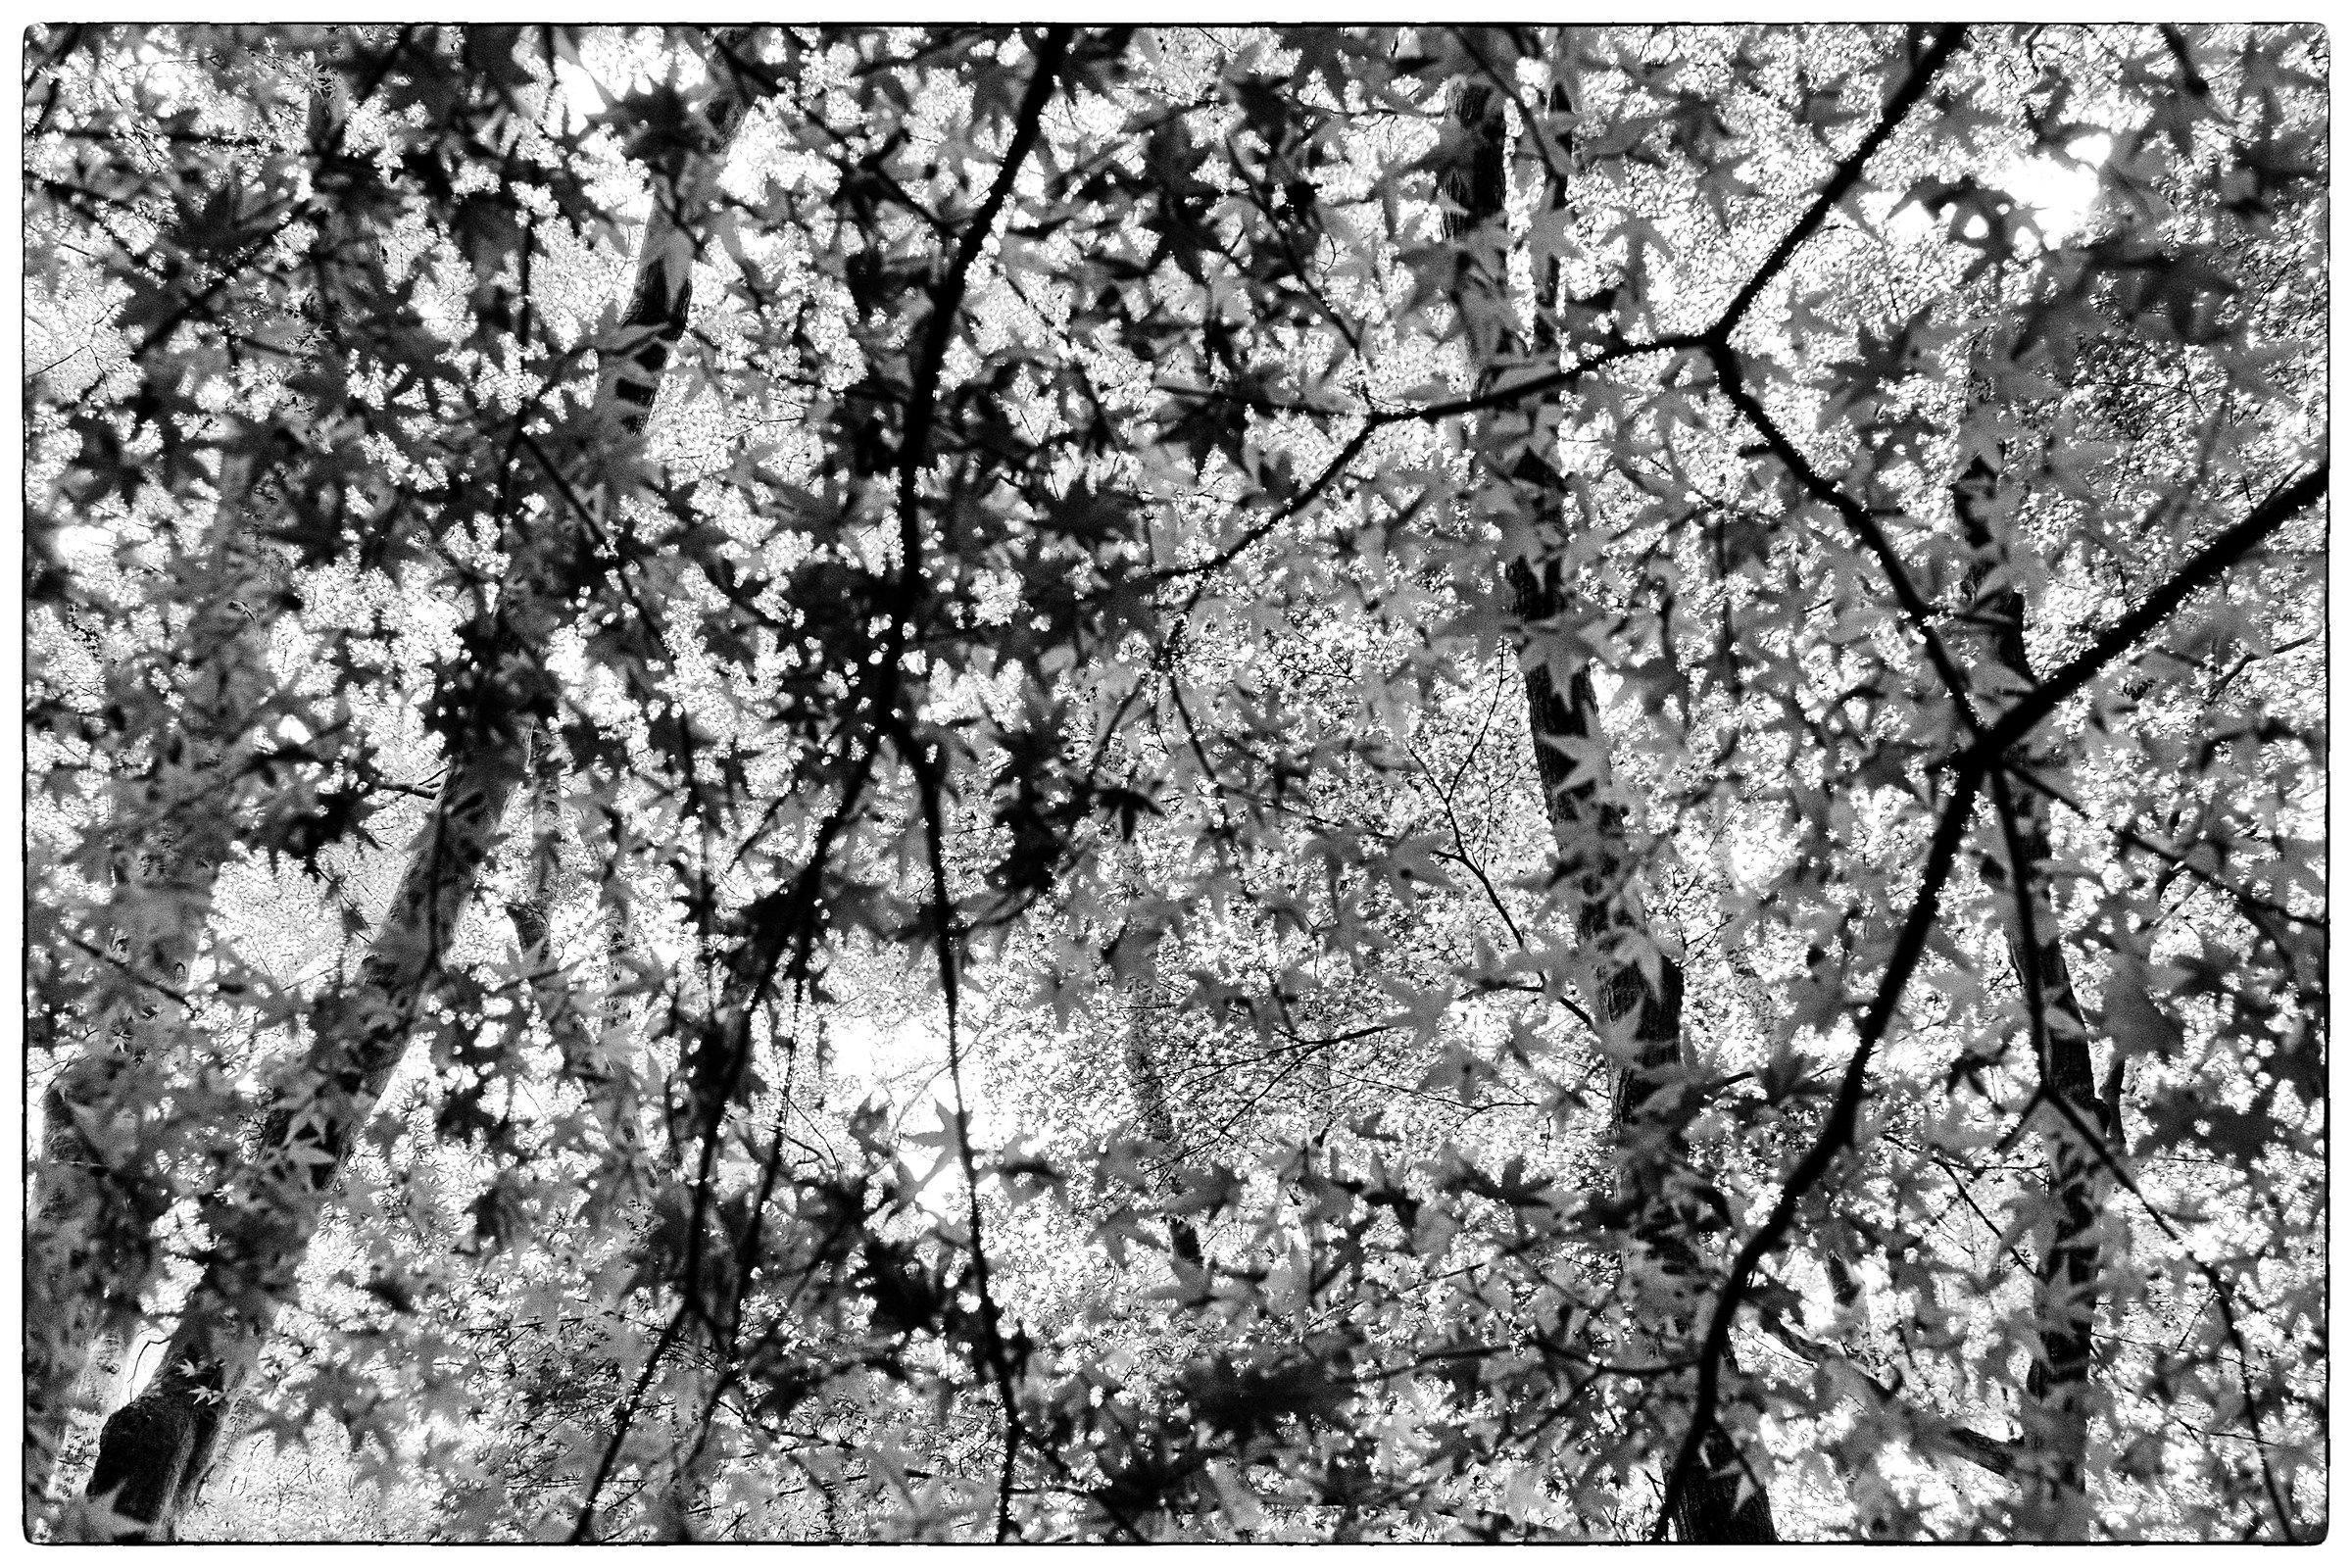 Under the star tree...